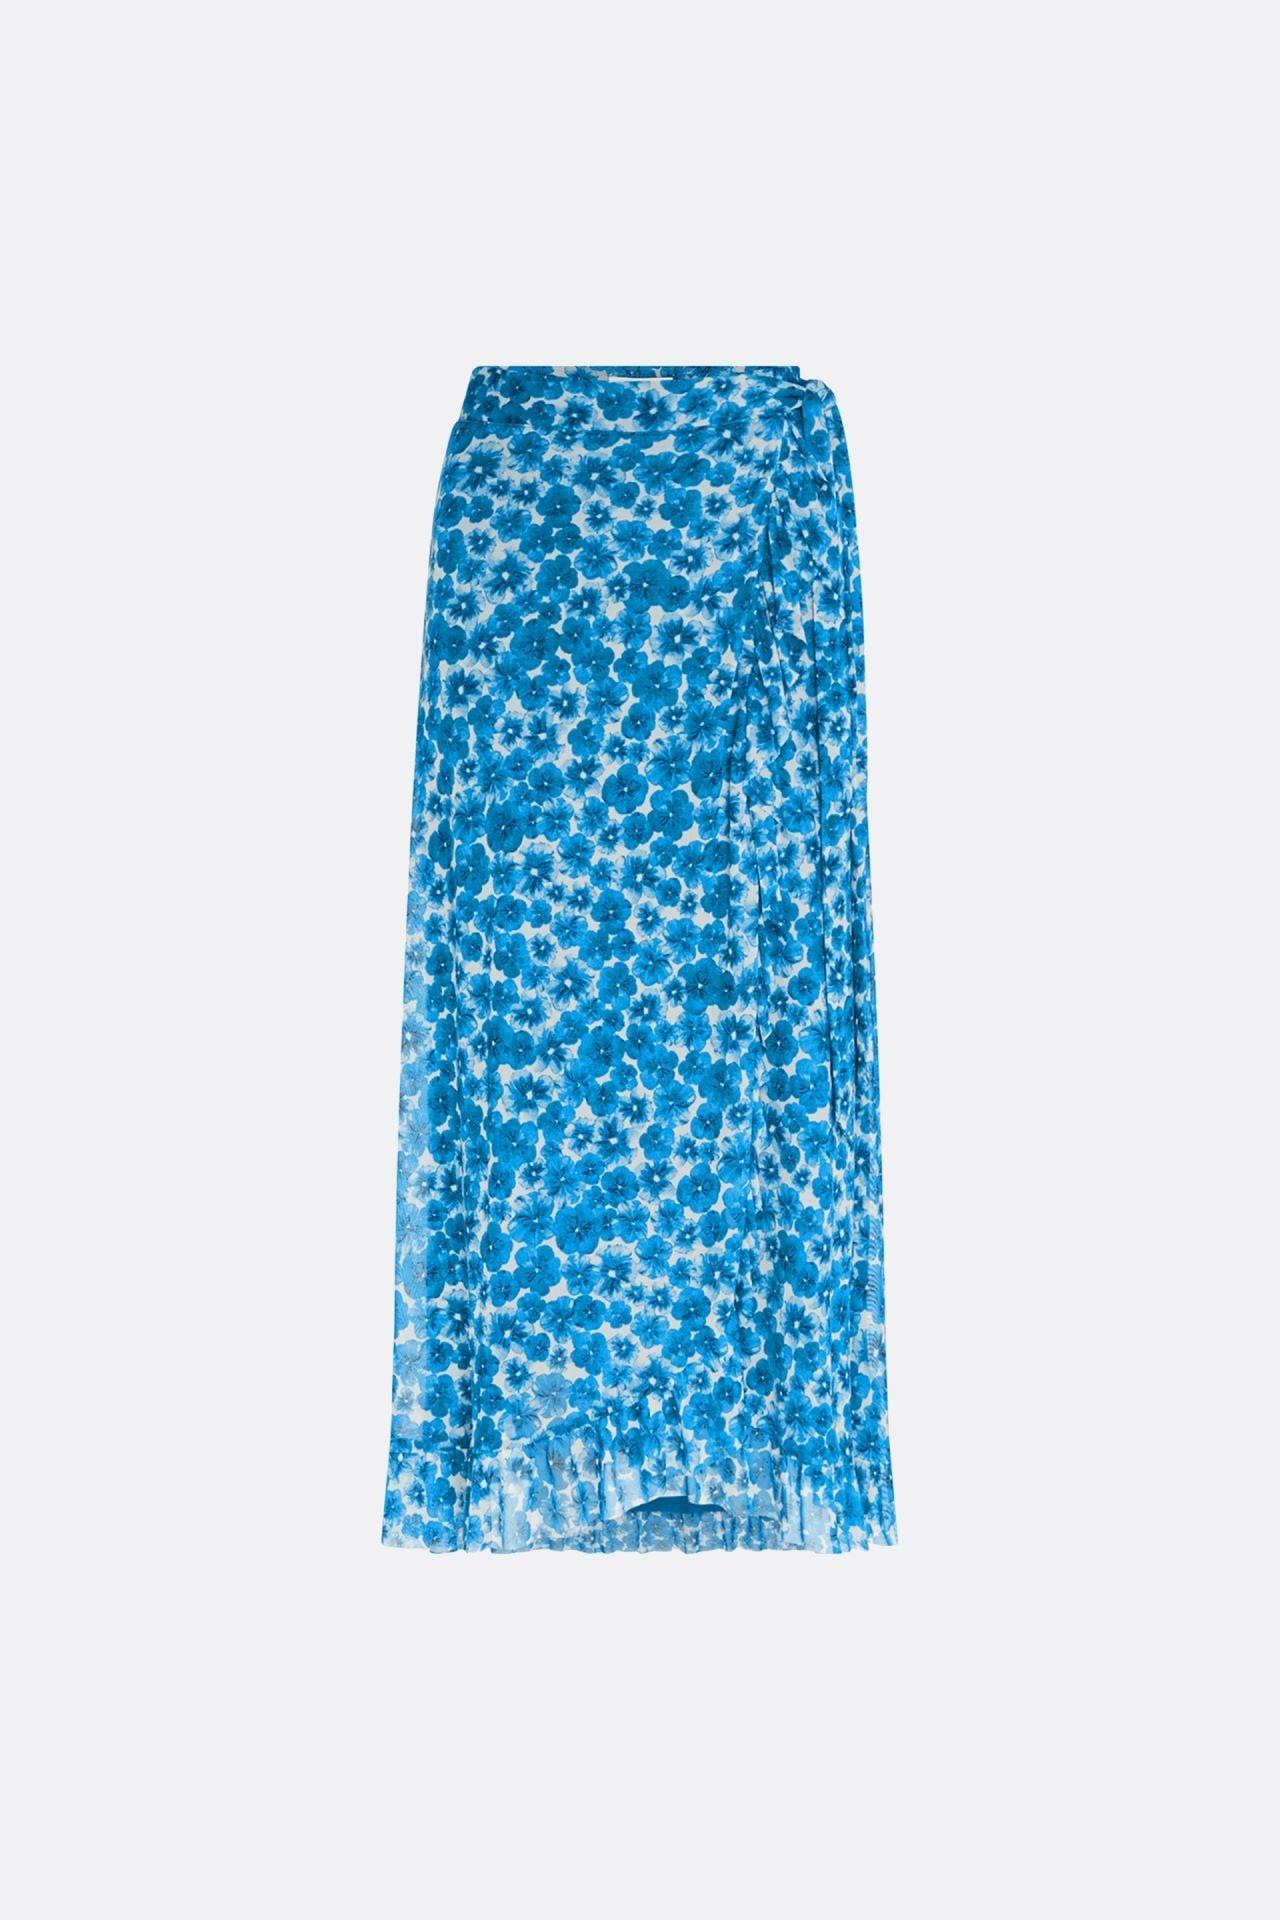 Fabienne Chapot Skirt BOBO CLT-126-1